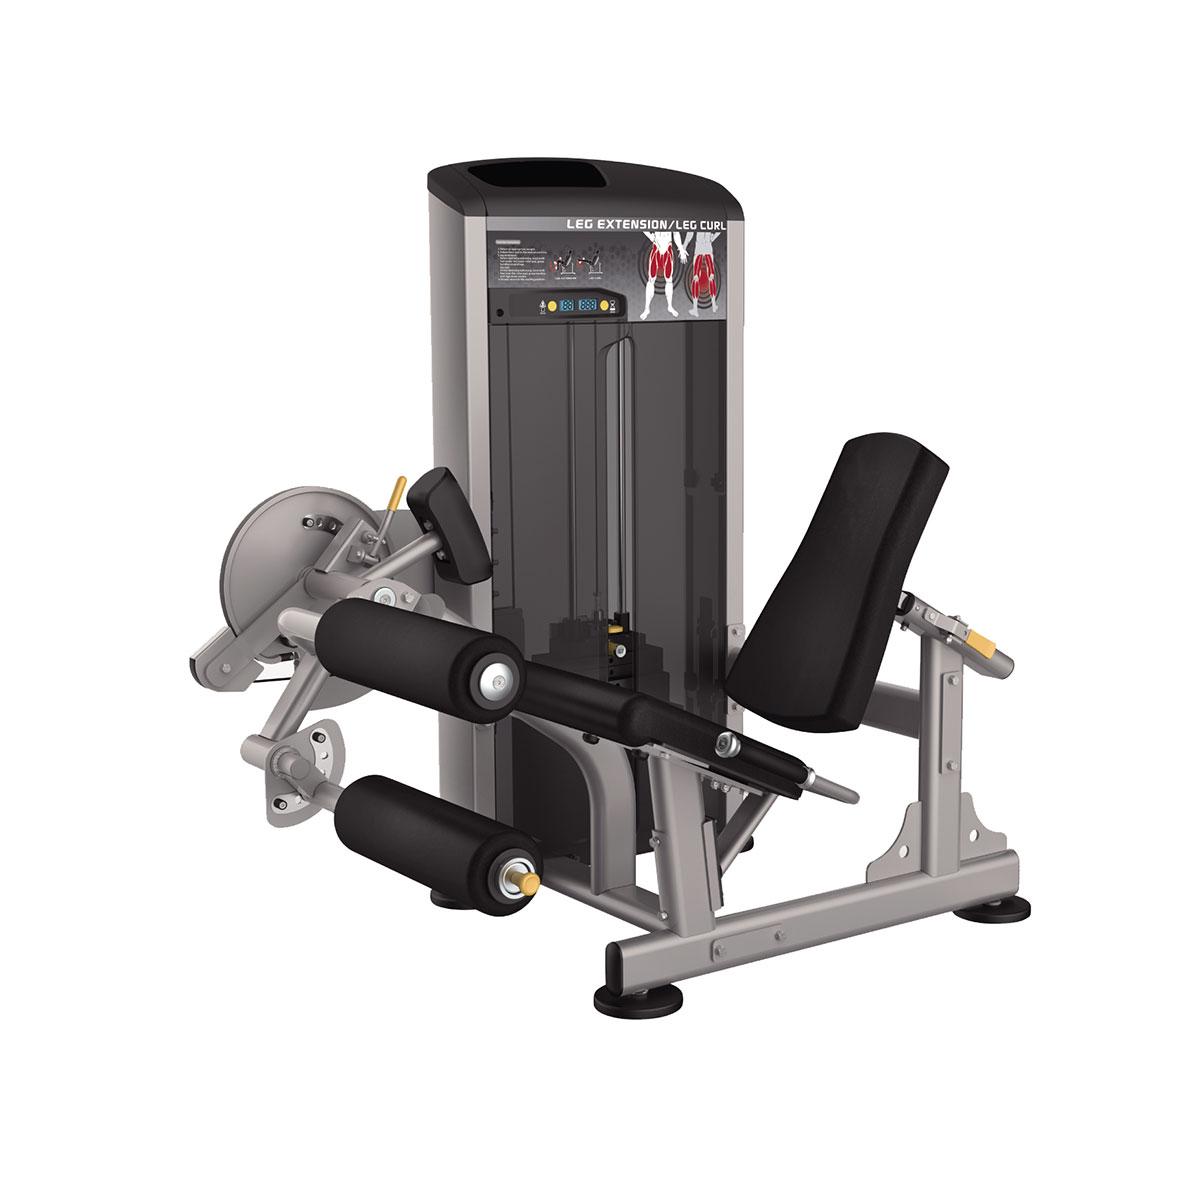 Leg Extension / Leg Curl - 200 lbs